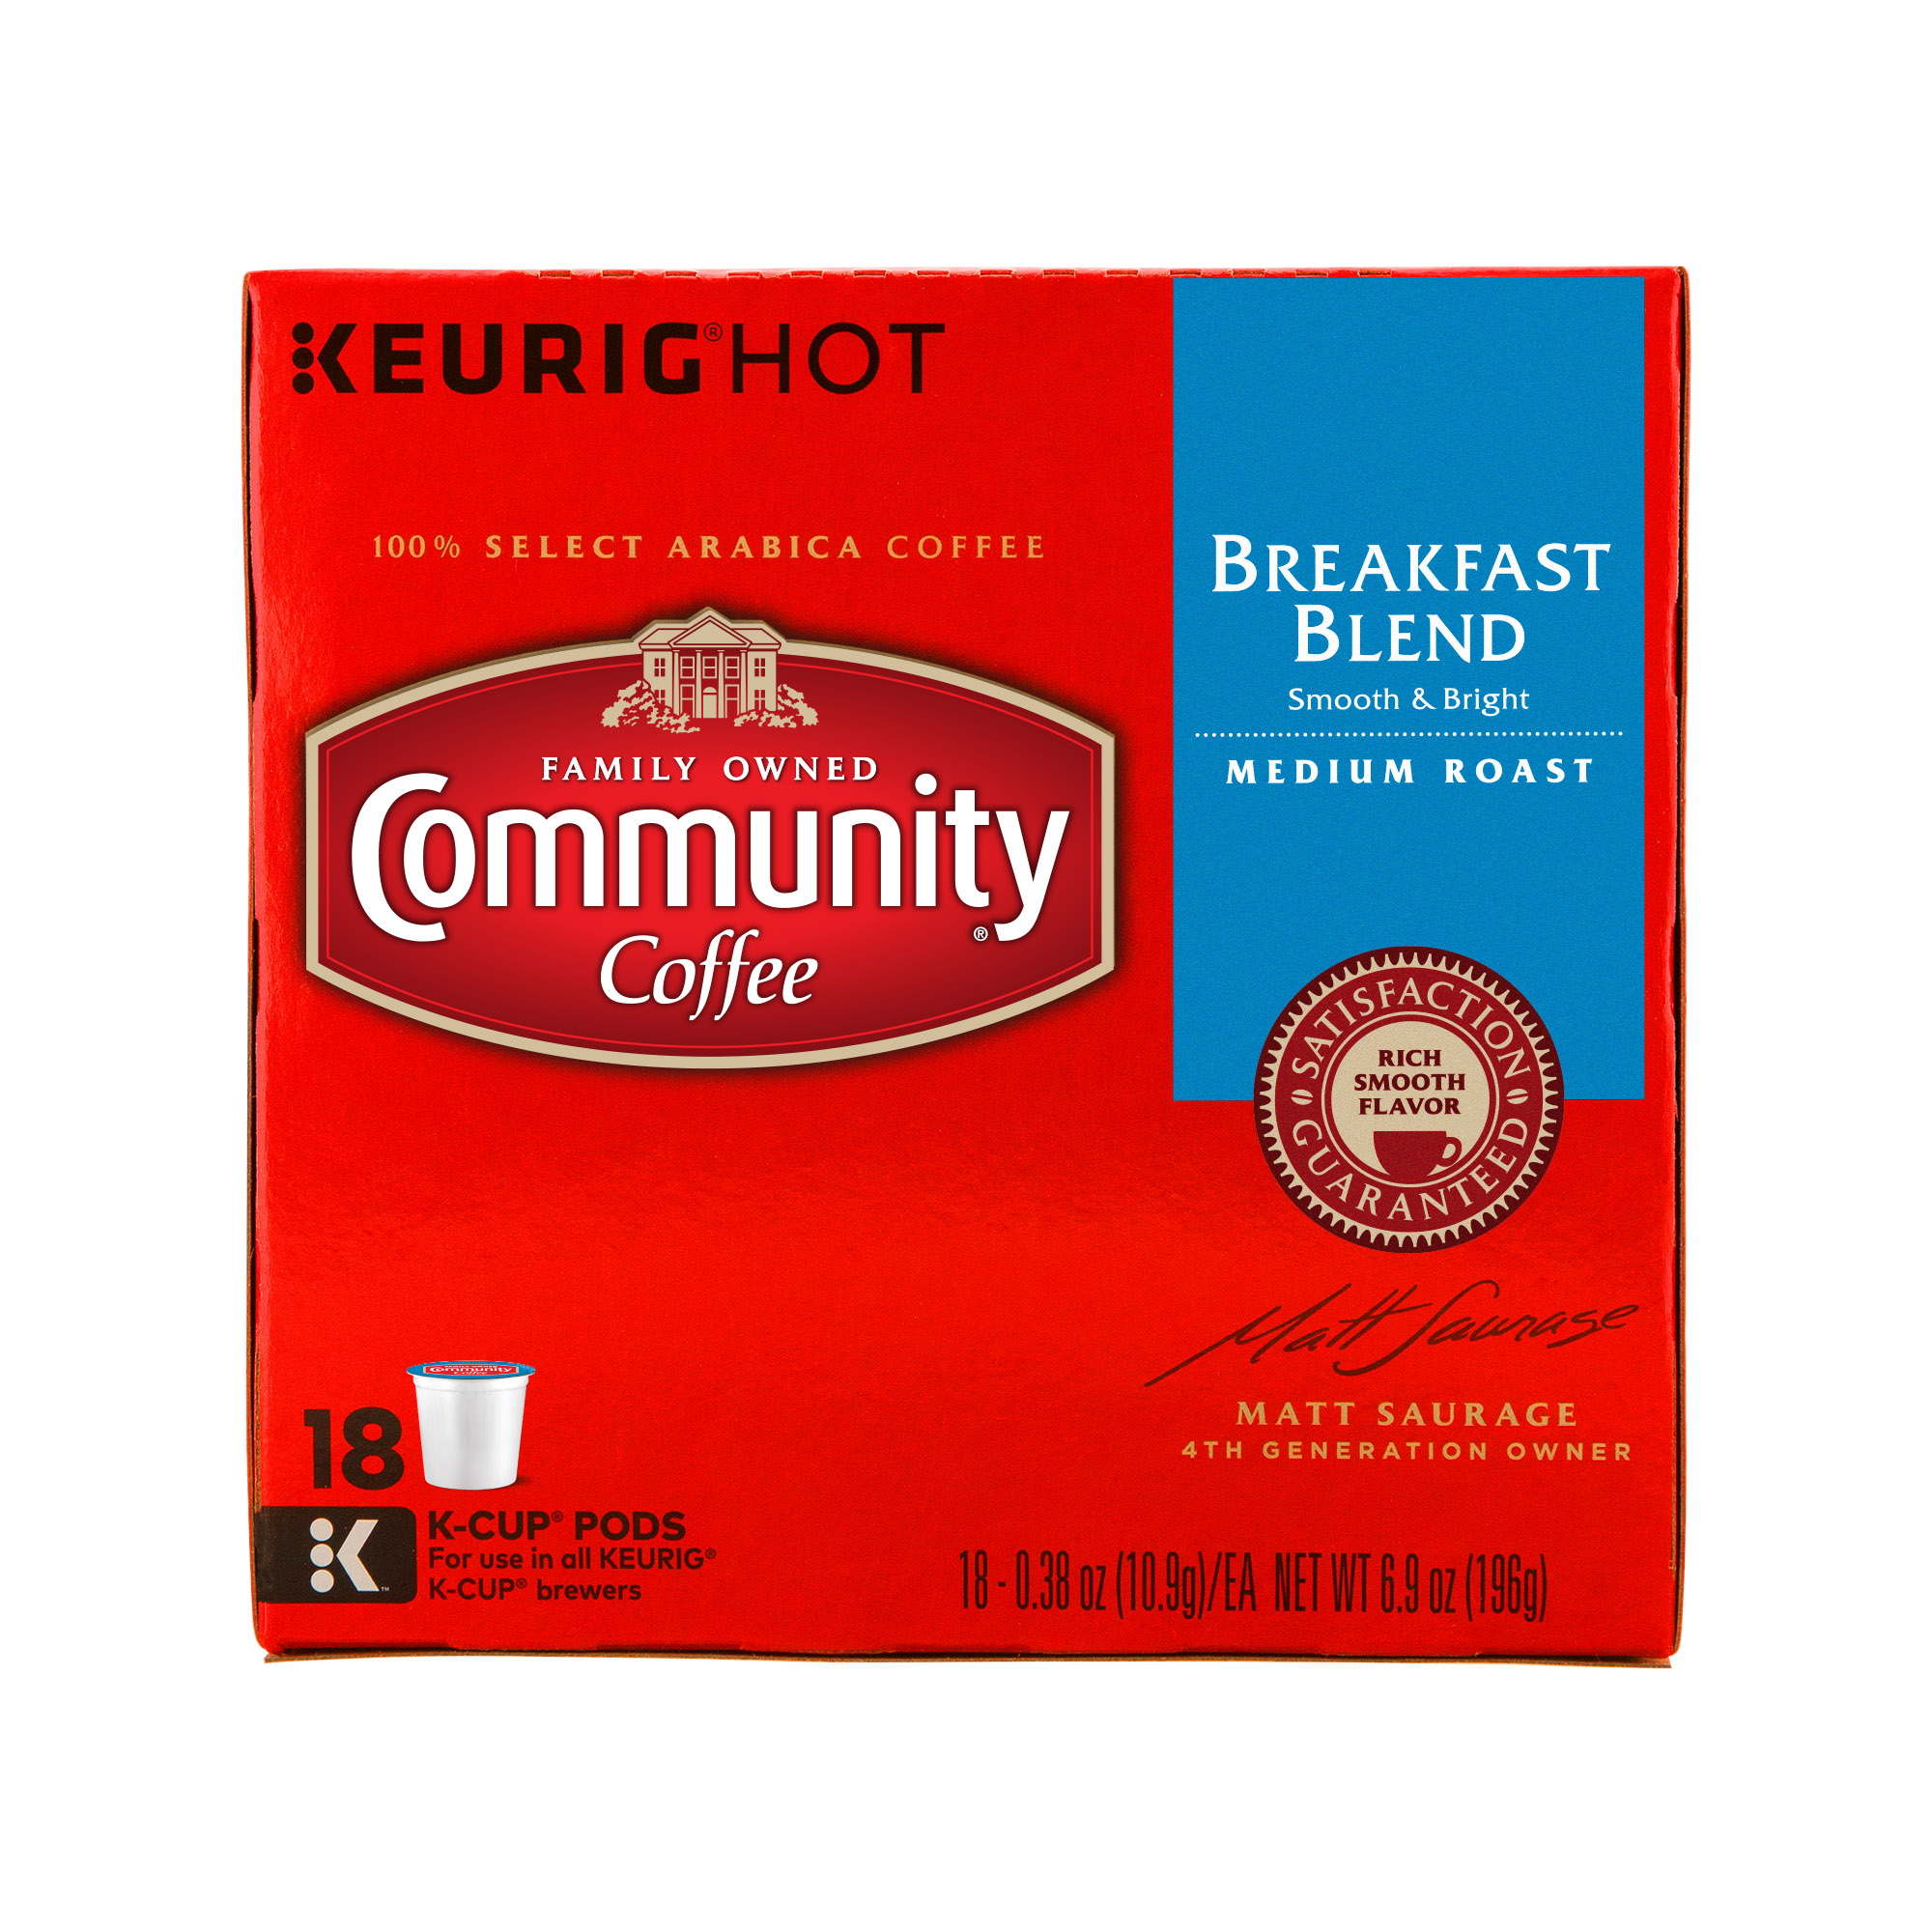 Community Coffee Single-Serve Cups Breakfast Blend Medium Roast Coffee, 18 Count